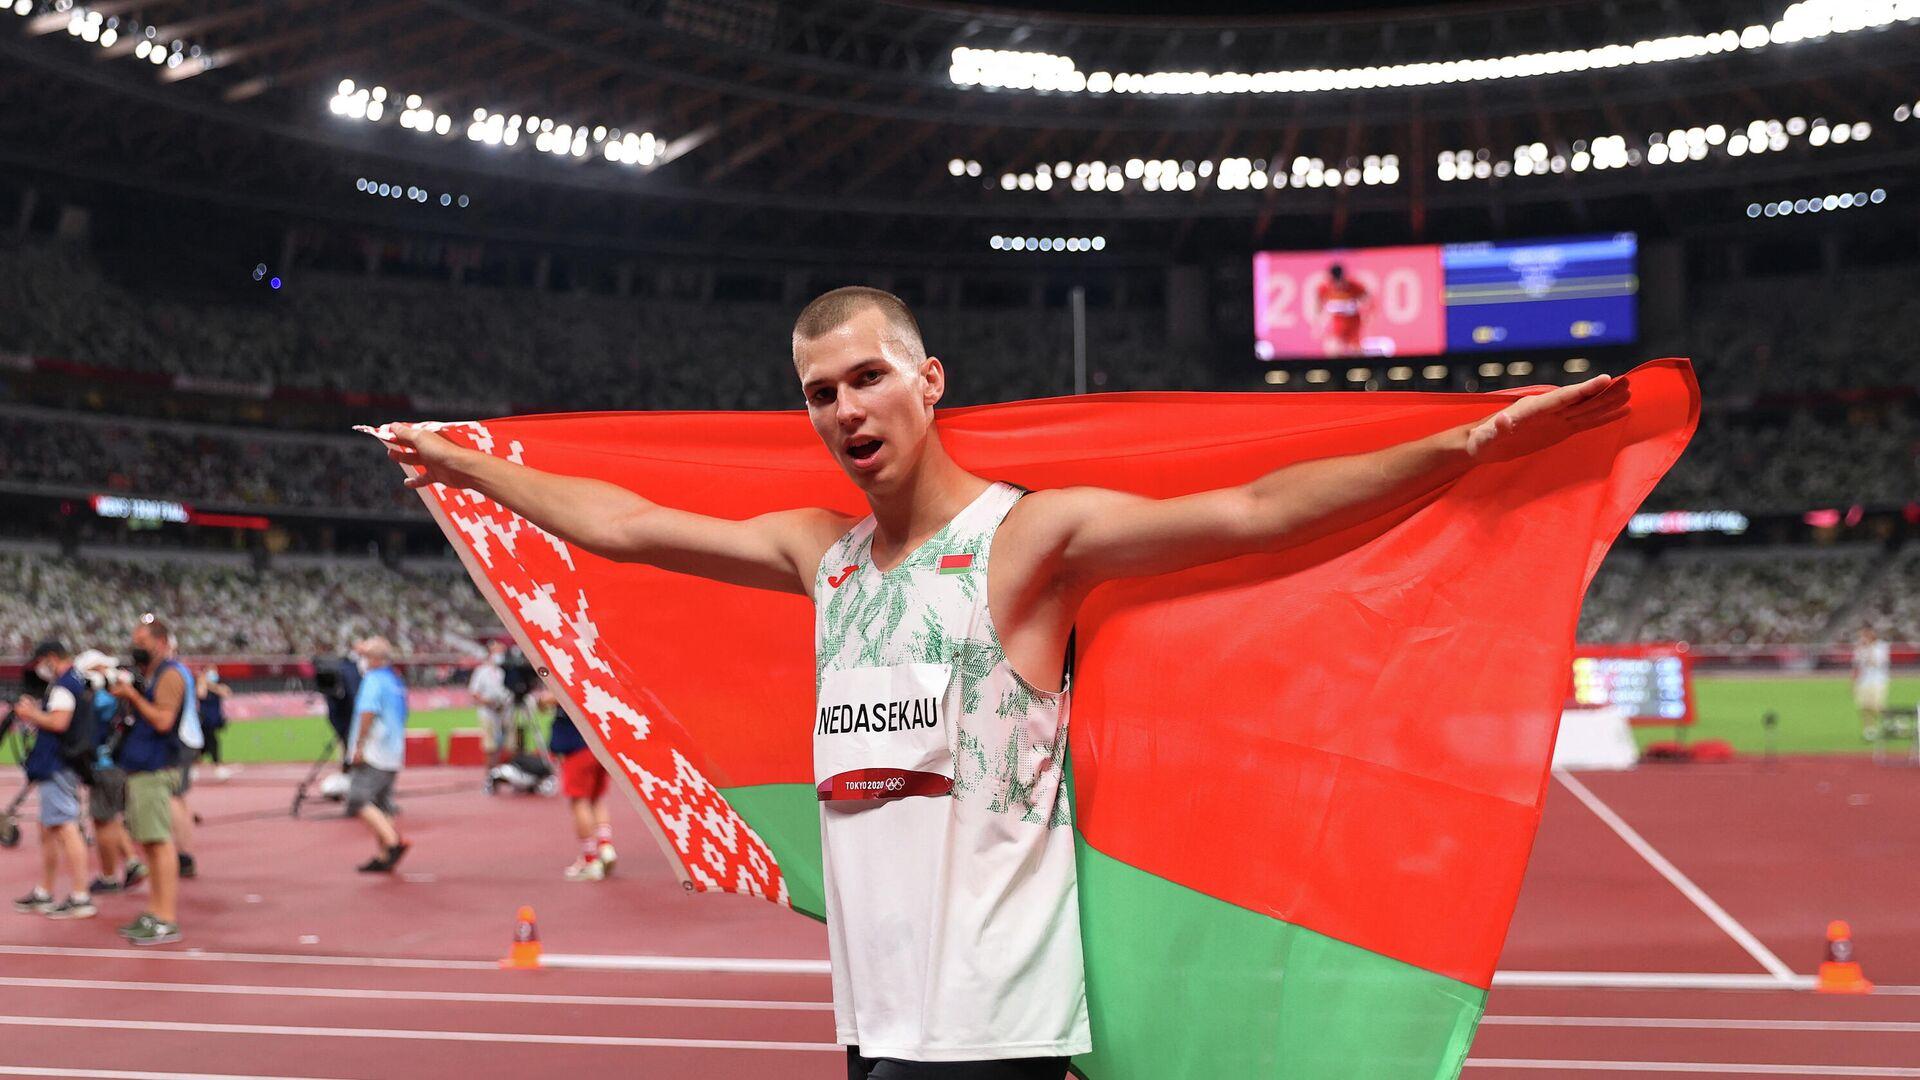 Максим Недосеков - Sputnik Беларусь, 1920, 26.09.2021